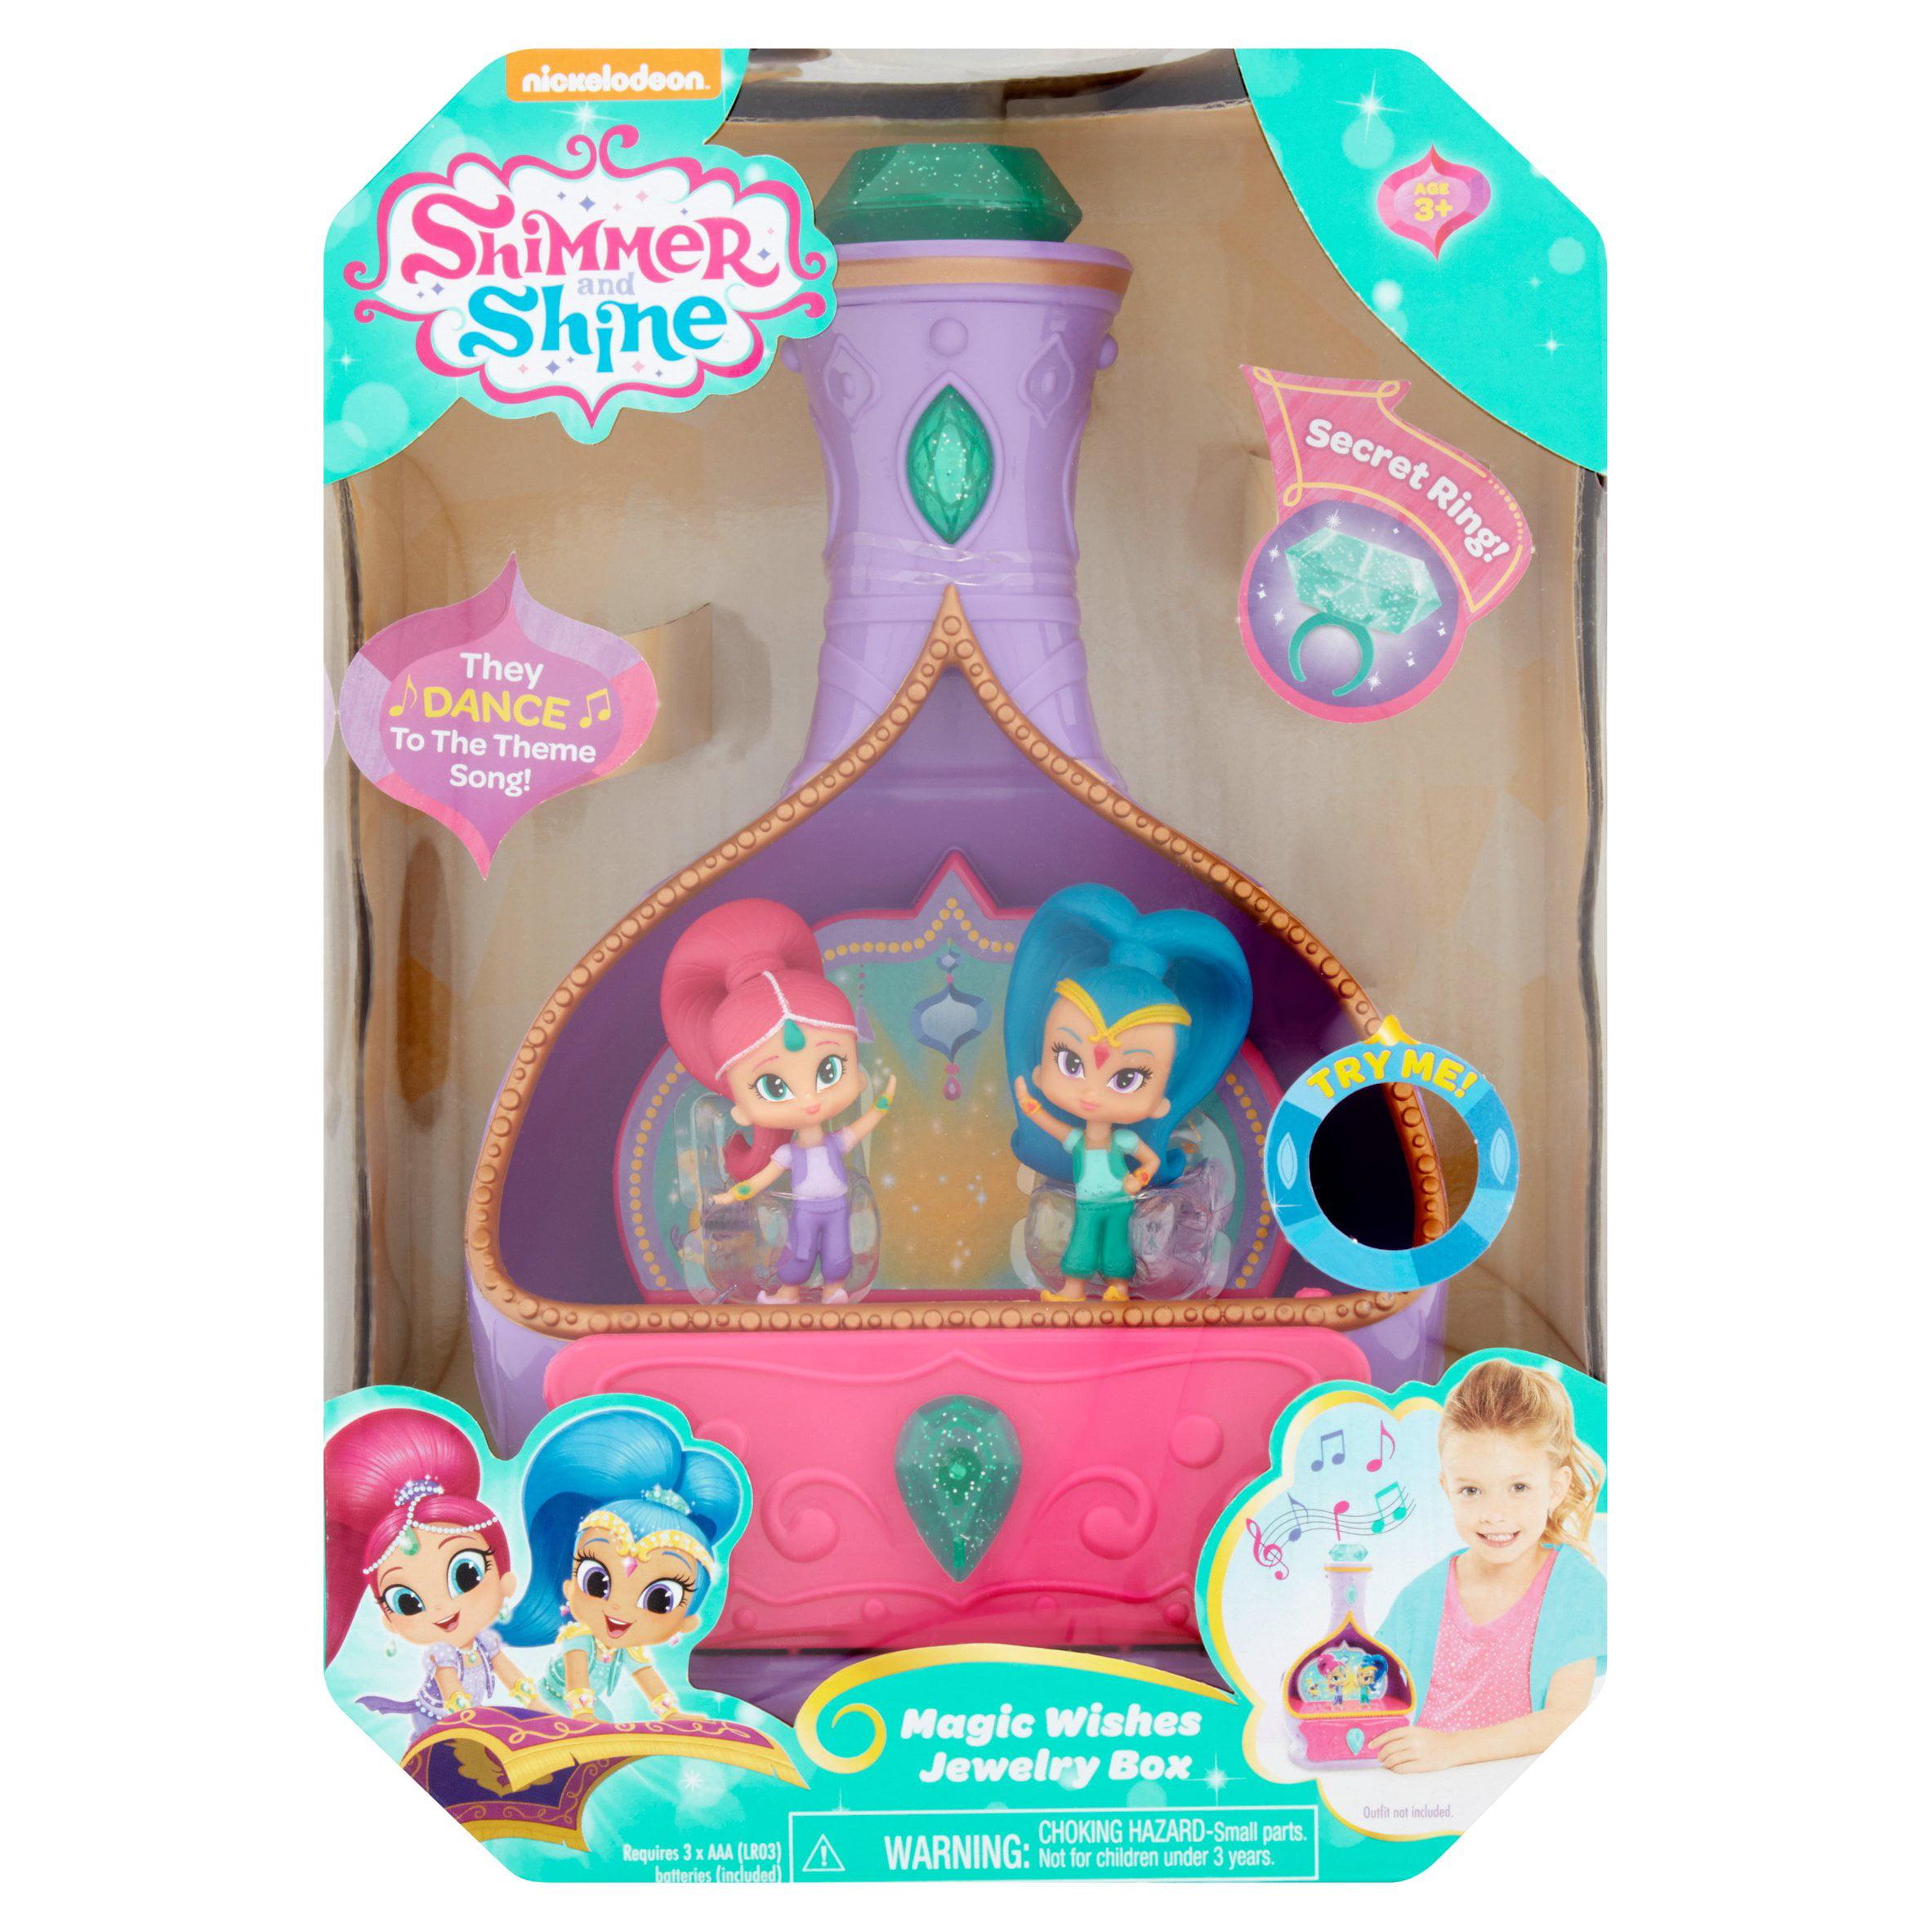 Nickelodeon Shimmer and Shine Magic Wishes Jewelry Box Age 3+